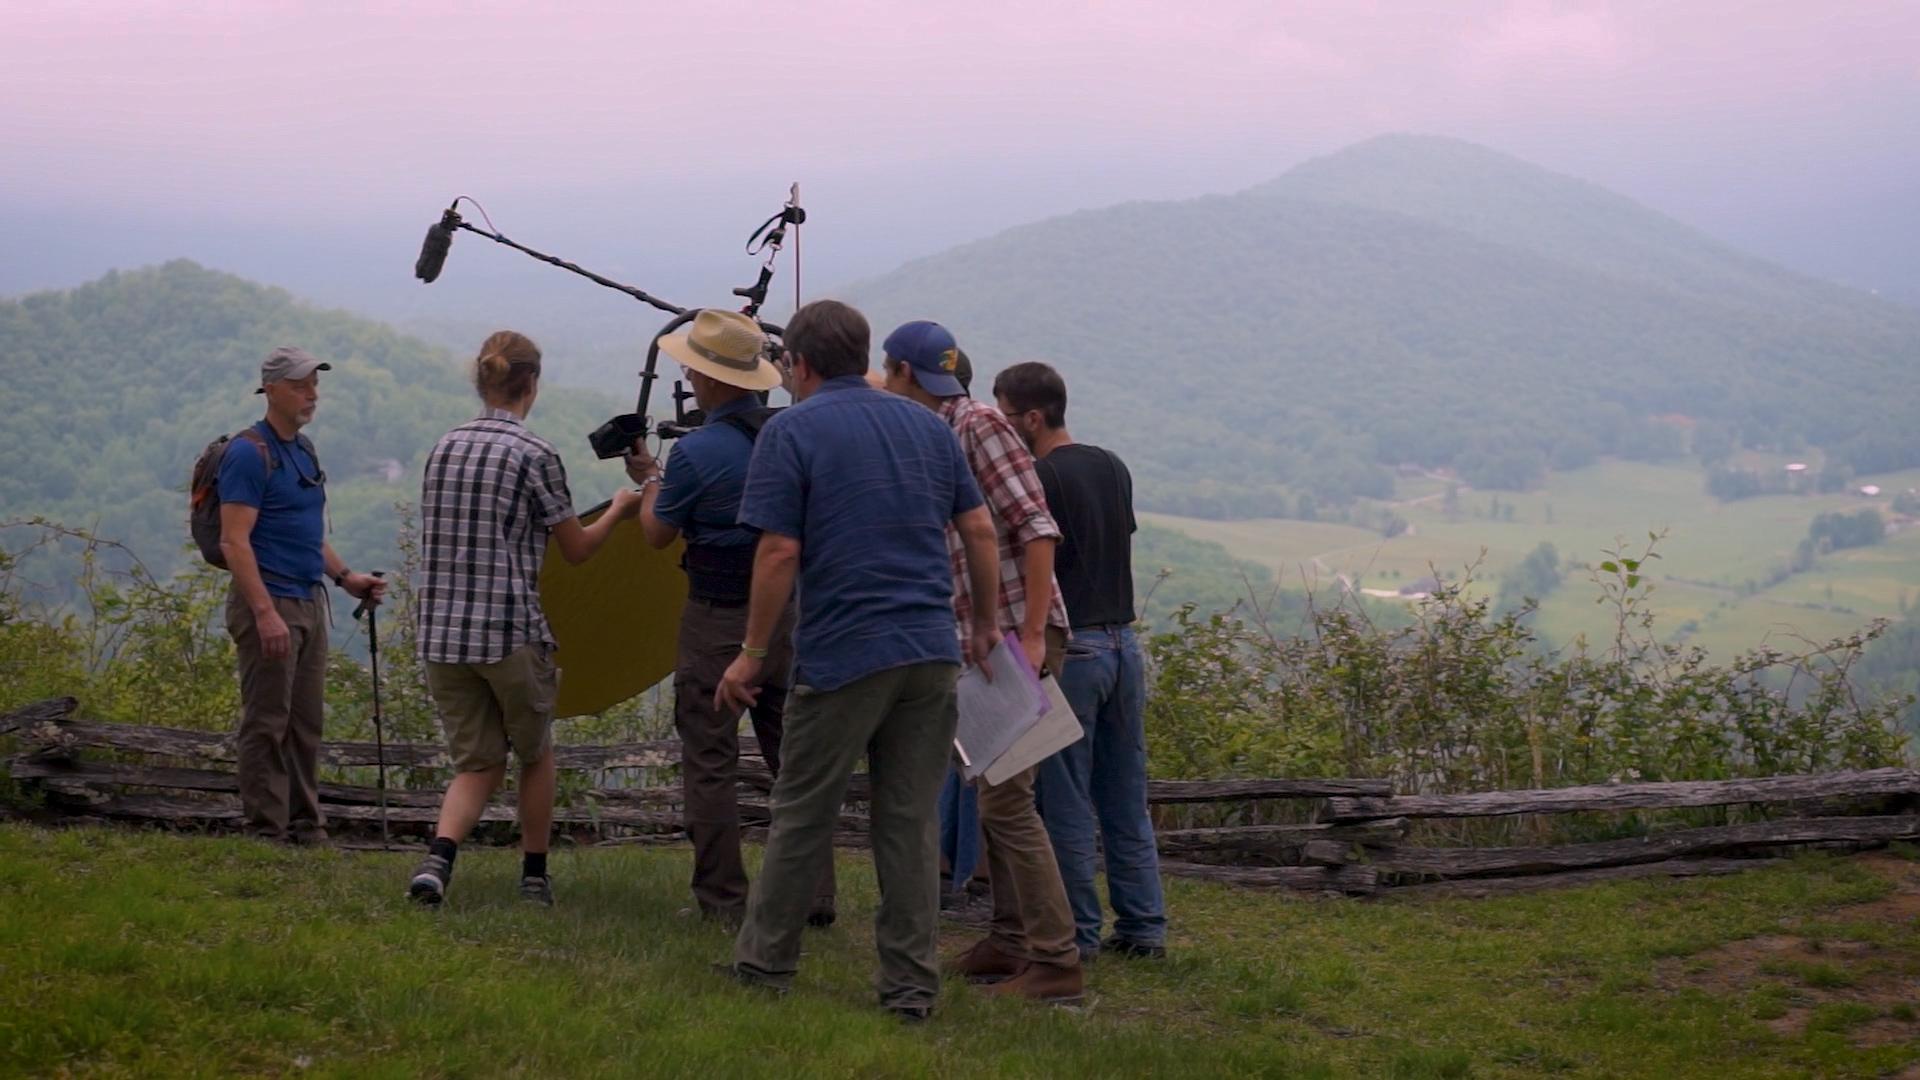 Film Production in Western North Carolina